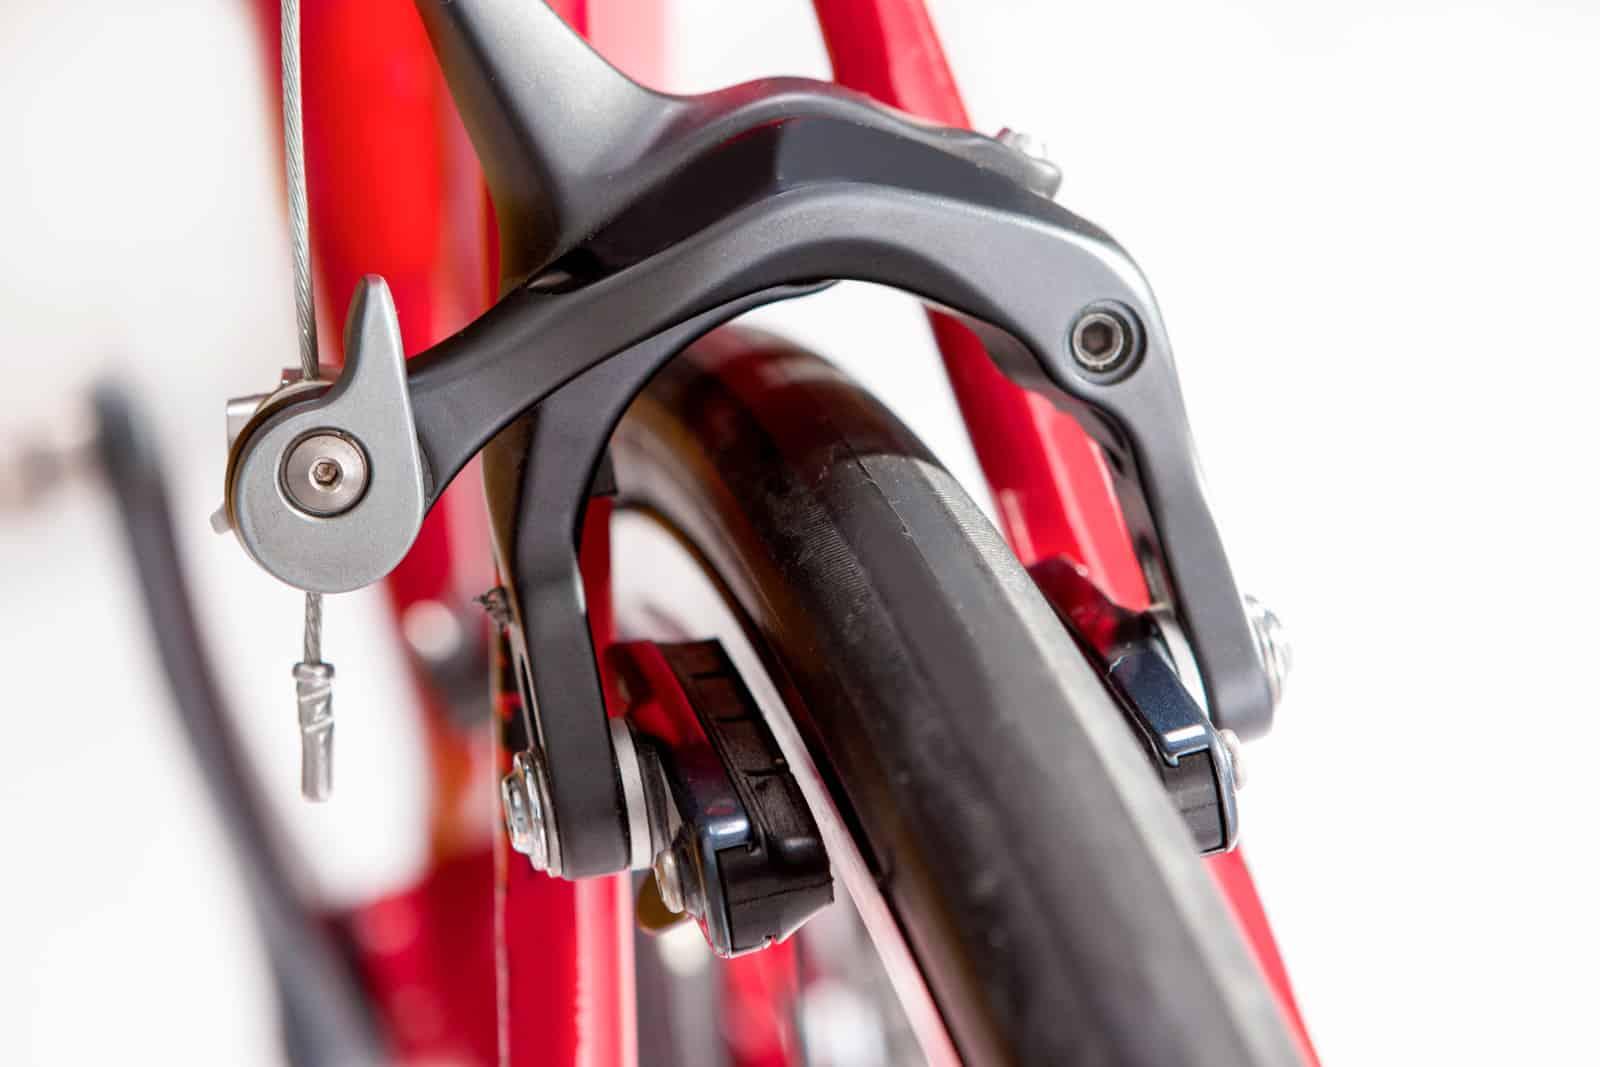 adjusting road bike brakes on the road